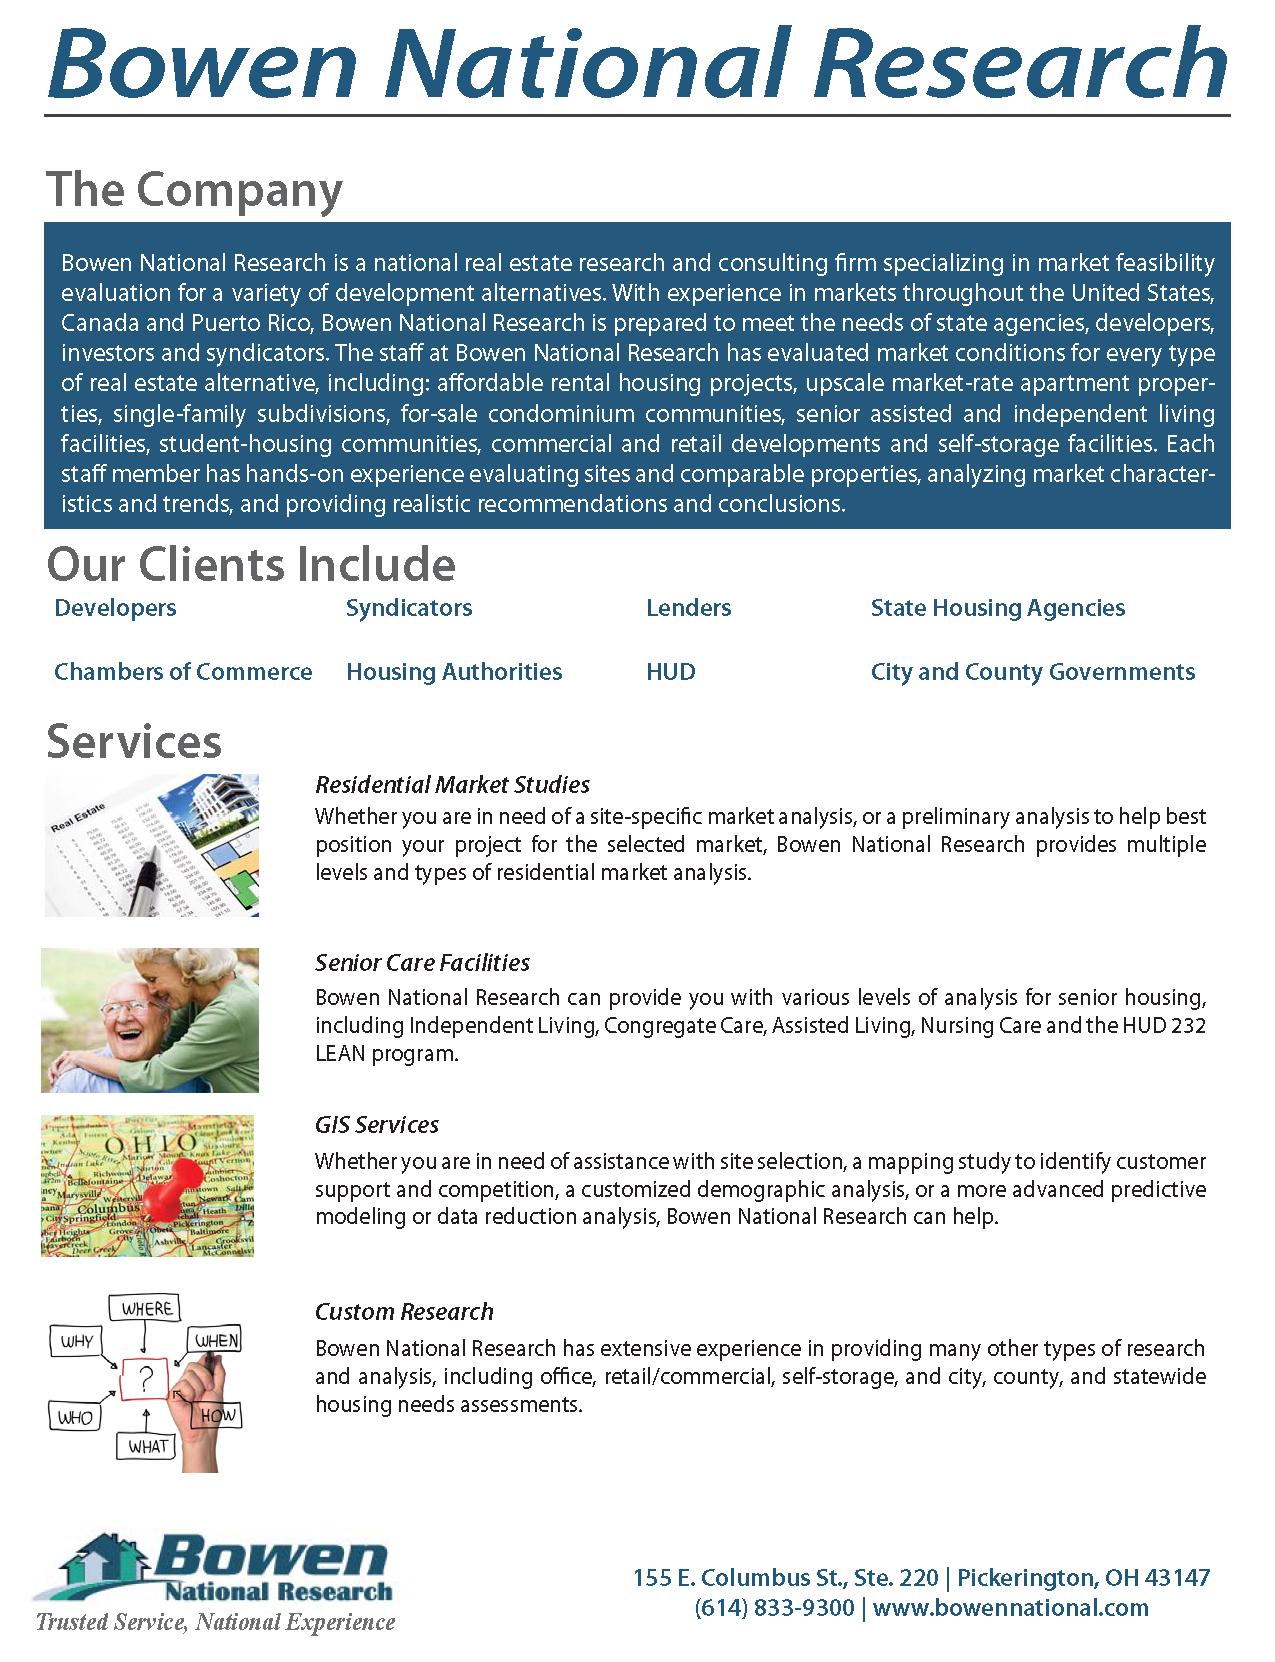 Bowen National Research Company Brochure